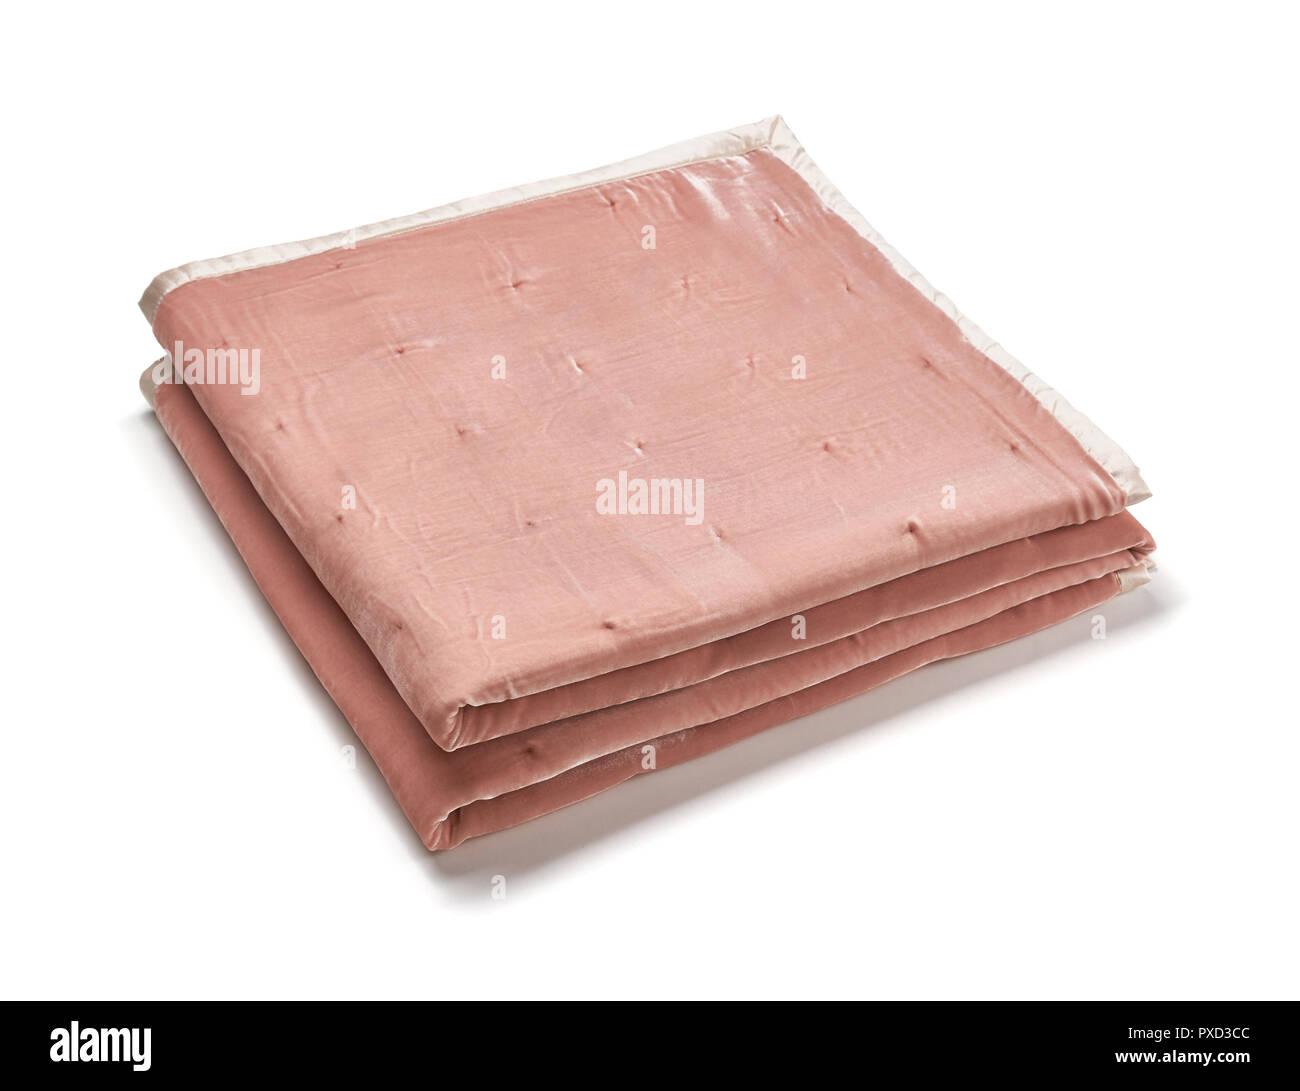 Pink blanket made of velor fabric, neatly folded, isolated on white background Stock Photo